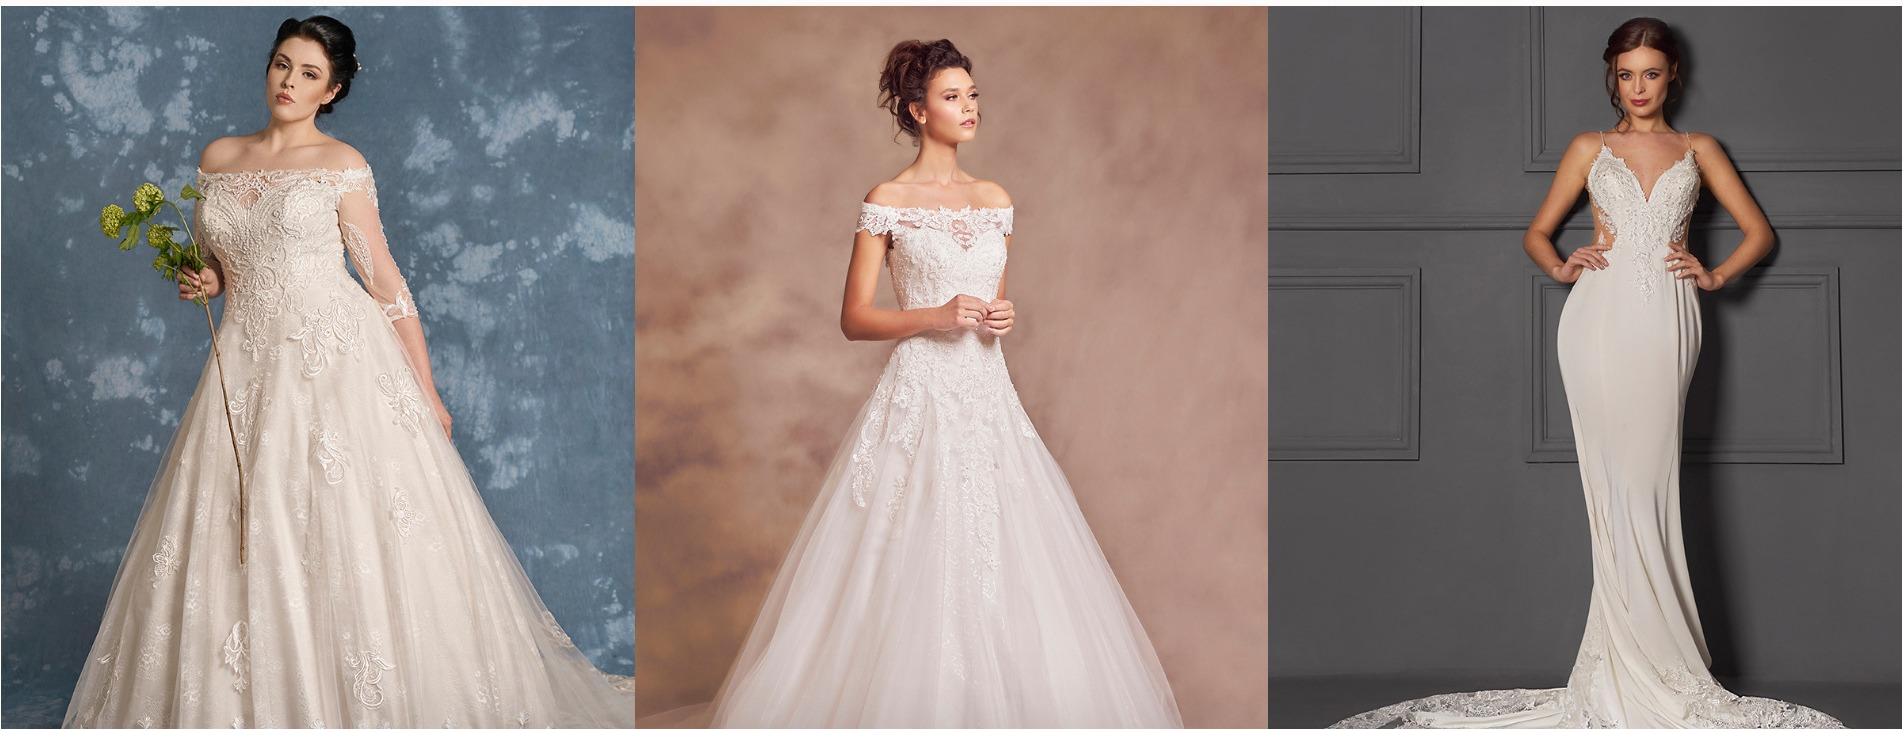 Phoenix Gowns – Wedding Dress Website